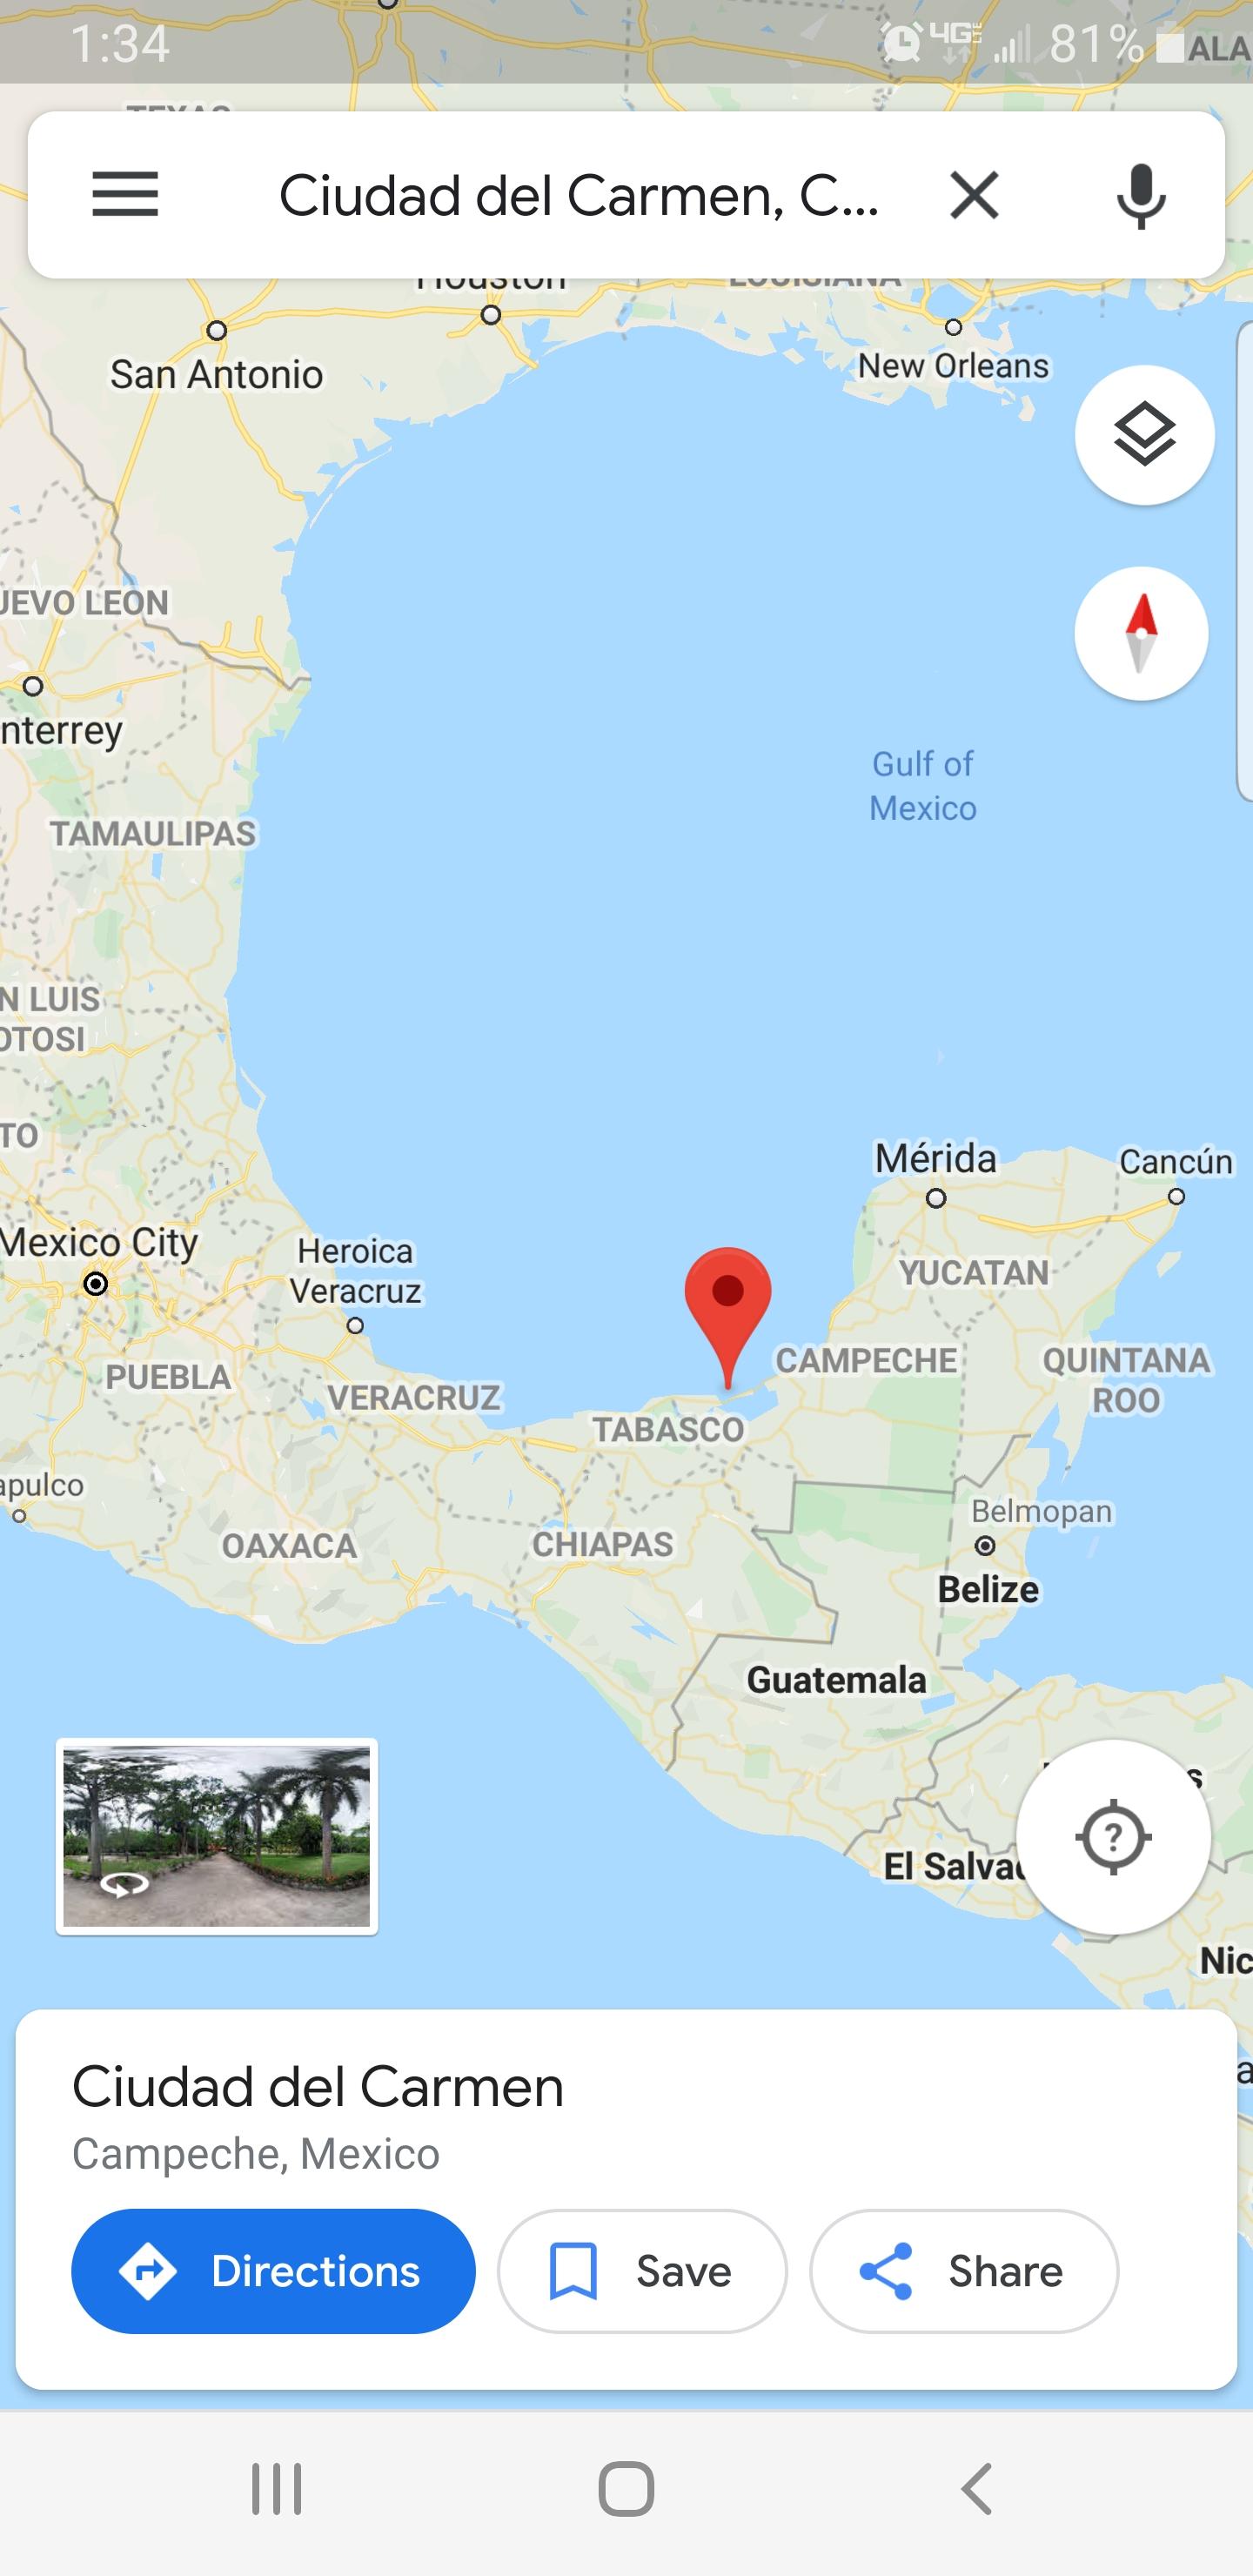 Piracy on the sea coming to the western hemisphere-screenshot_20191113-133412_maps.jpg